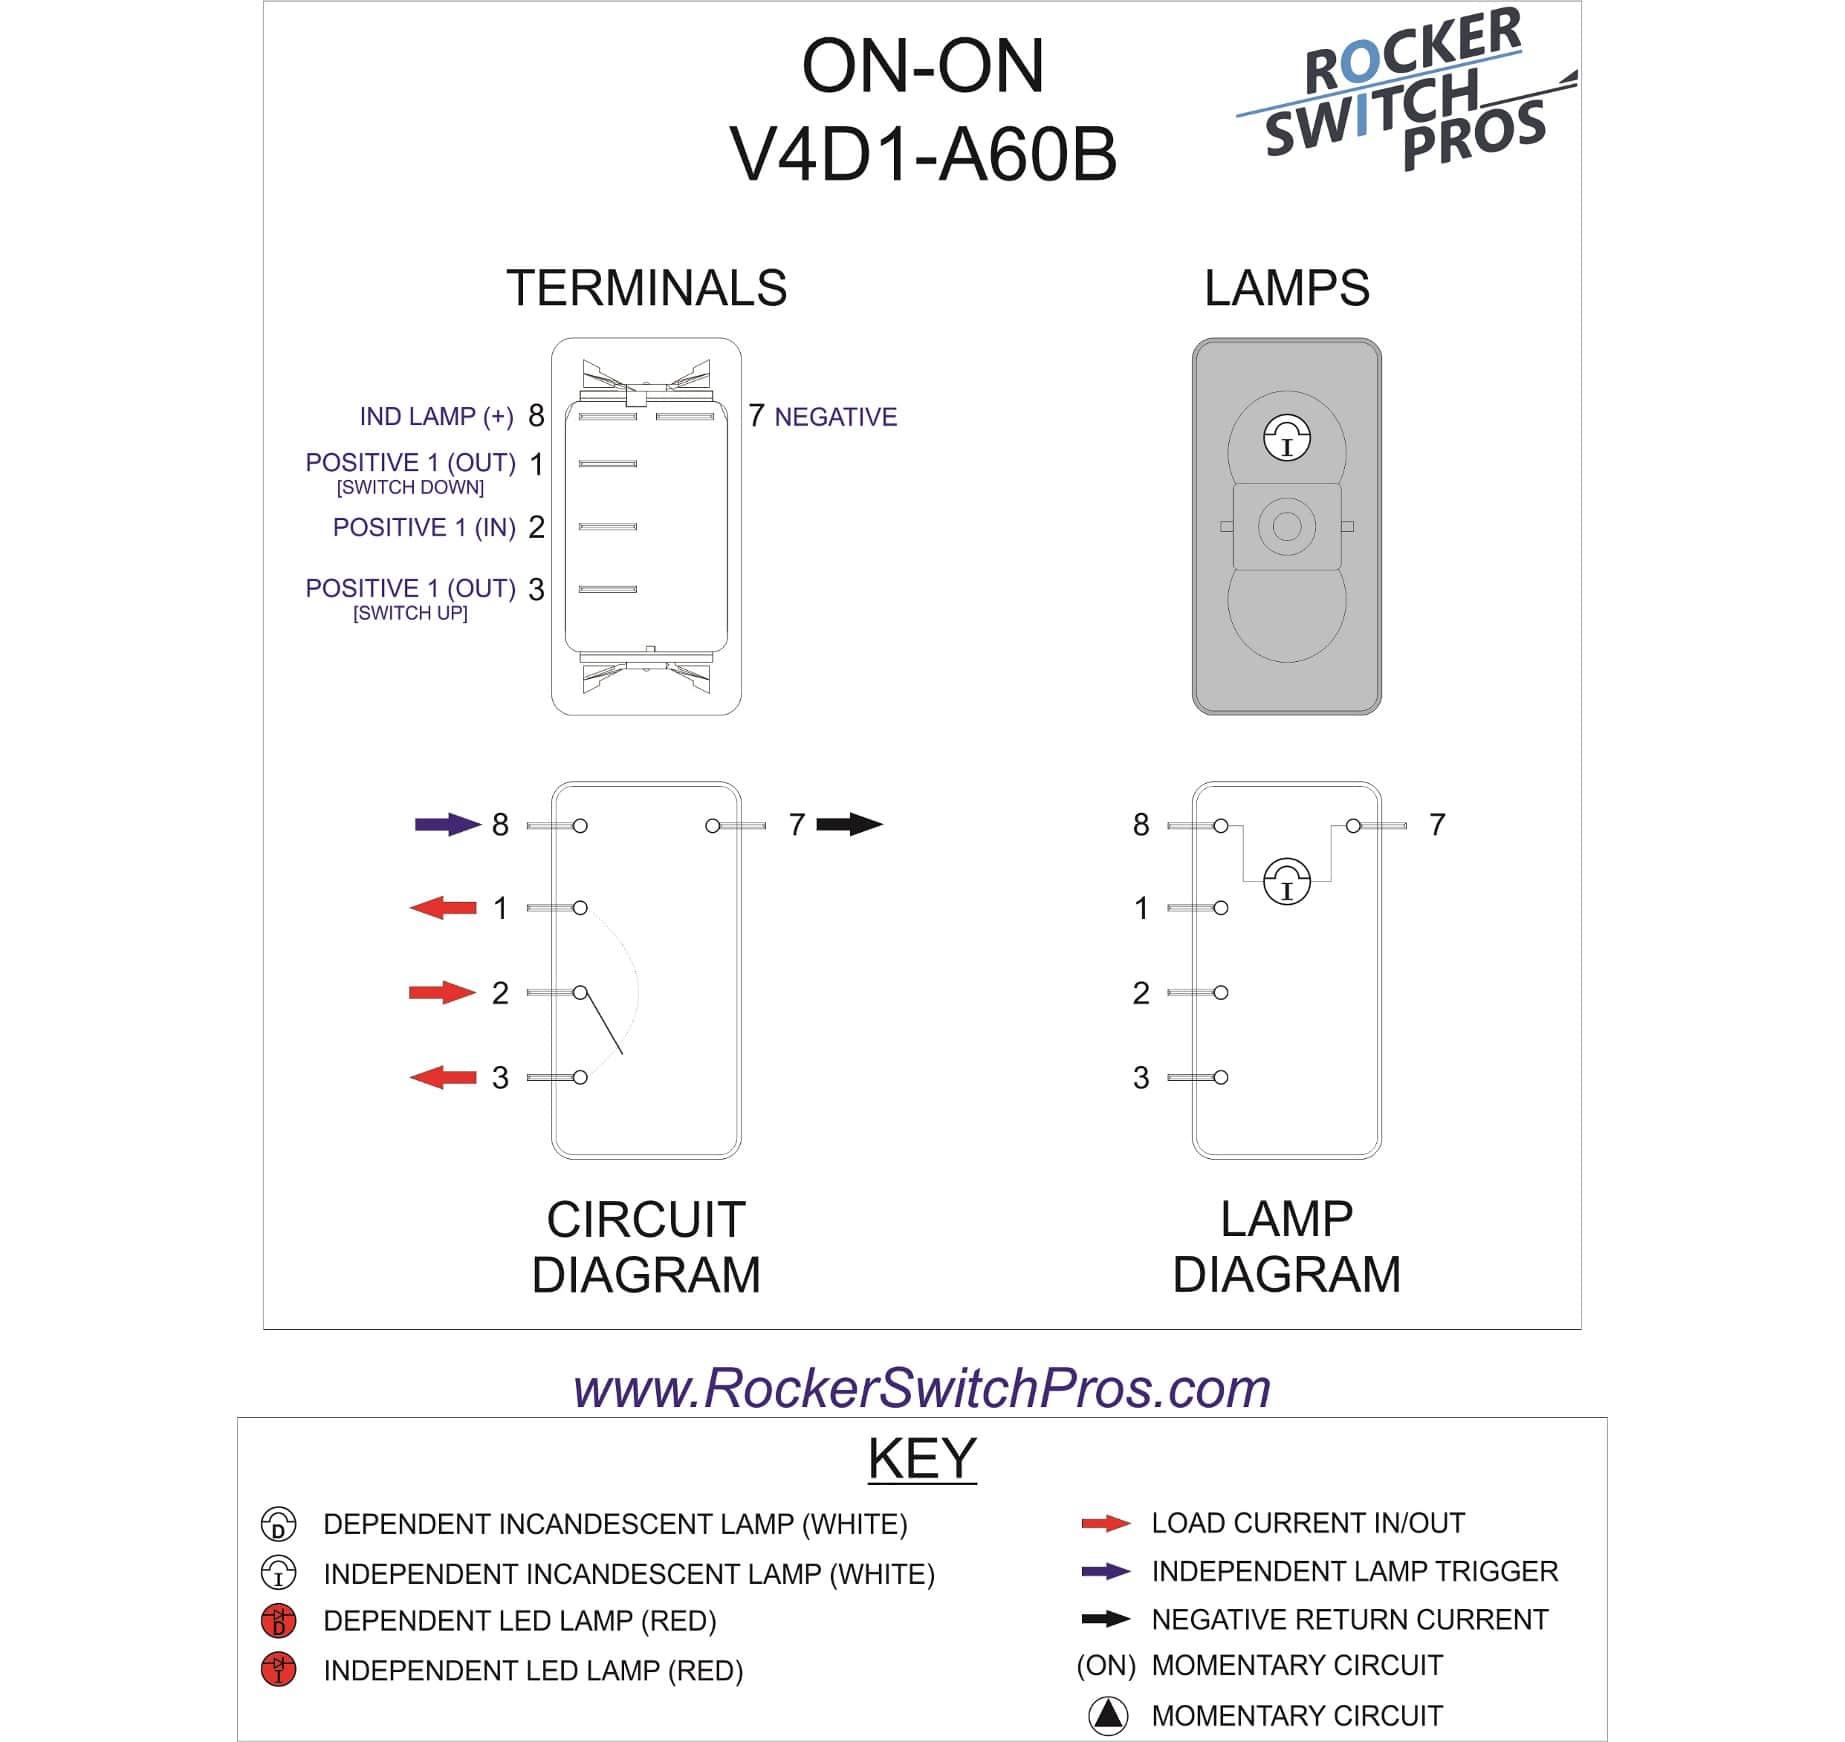 Rocker Switch Wire Diagram - Wiring Diagram Data Oreo - 3 Pin Rocker Switch Wiring Diagram